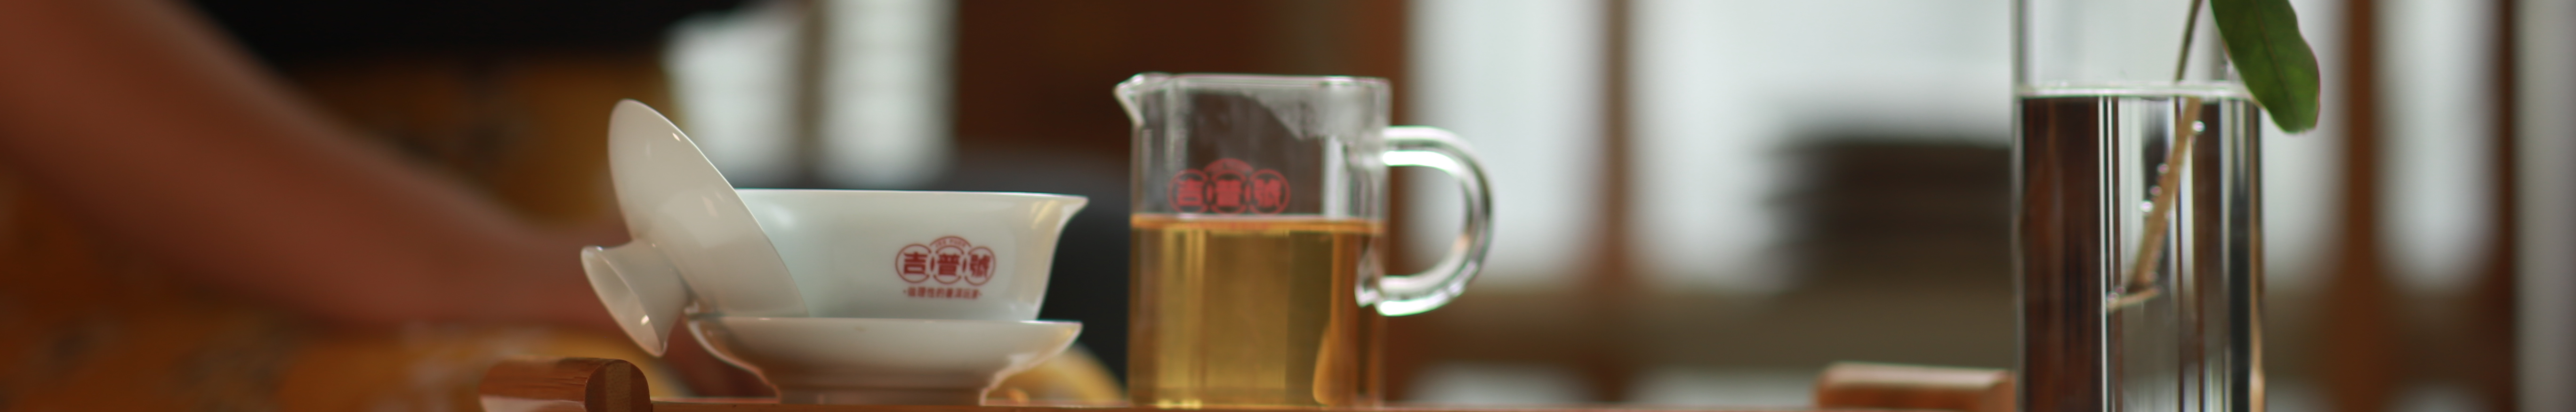 吉普号普洱茶 banner